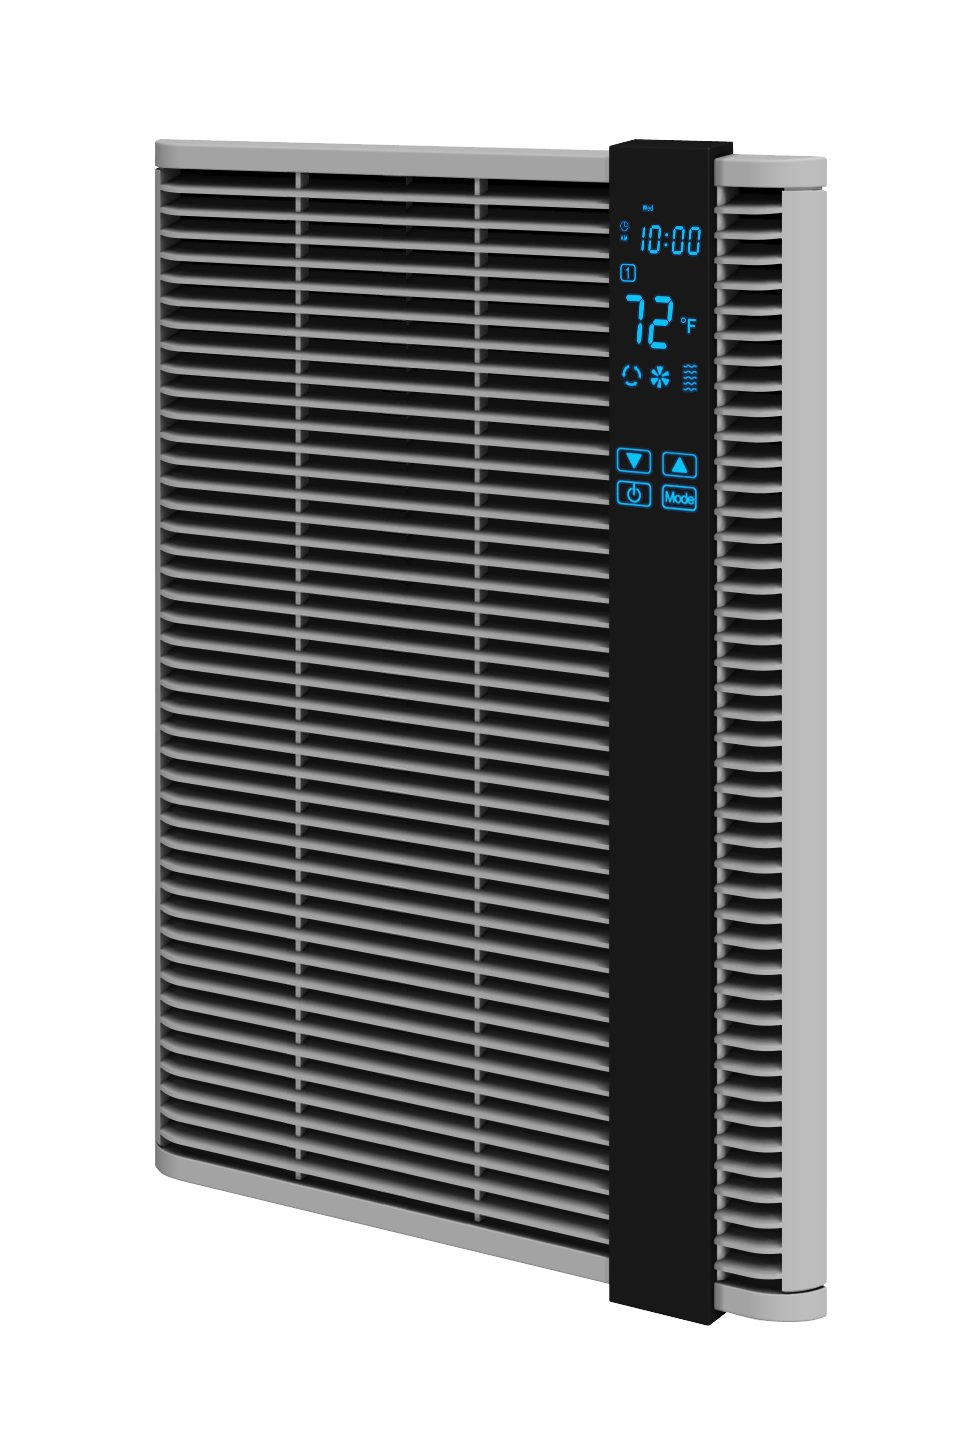 Fahrenheat FSSWH1502 Low Output Smart Series Forced Air Heater, 120-volt